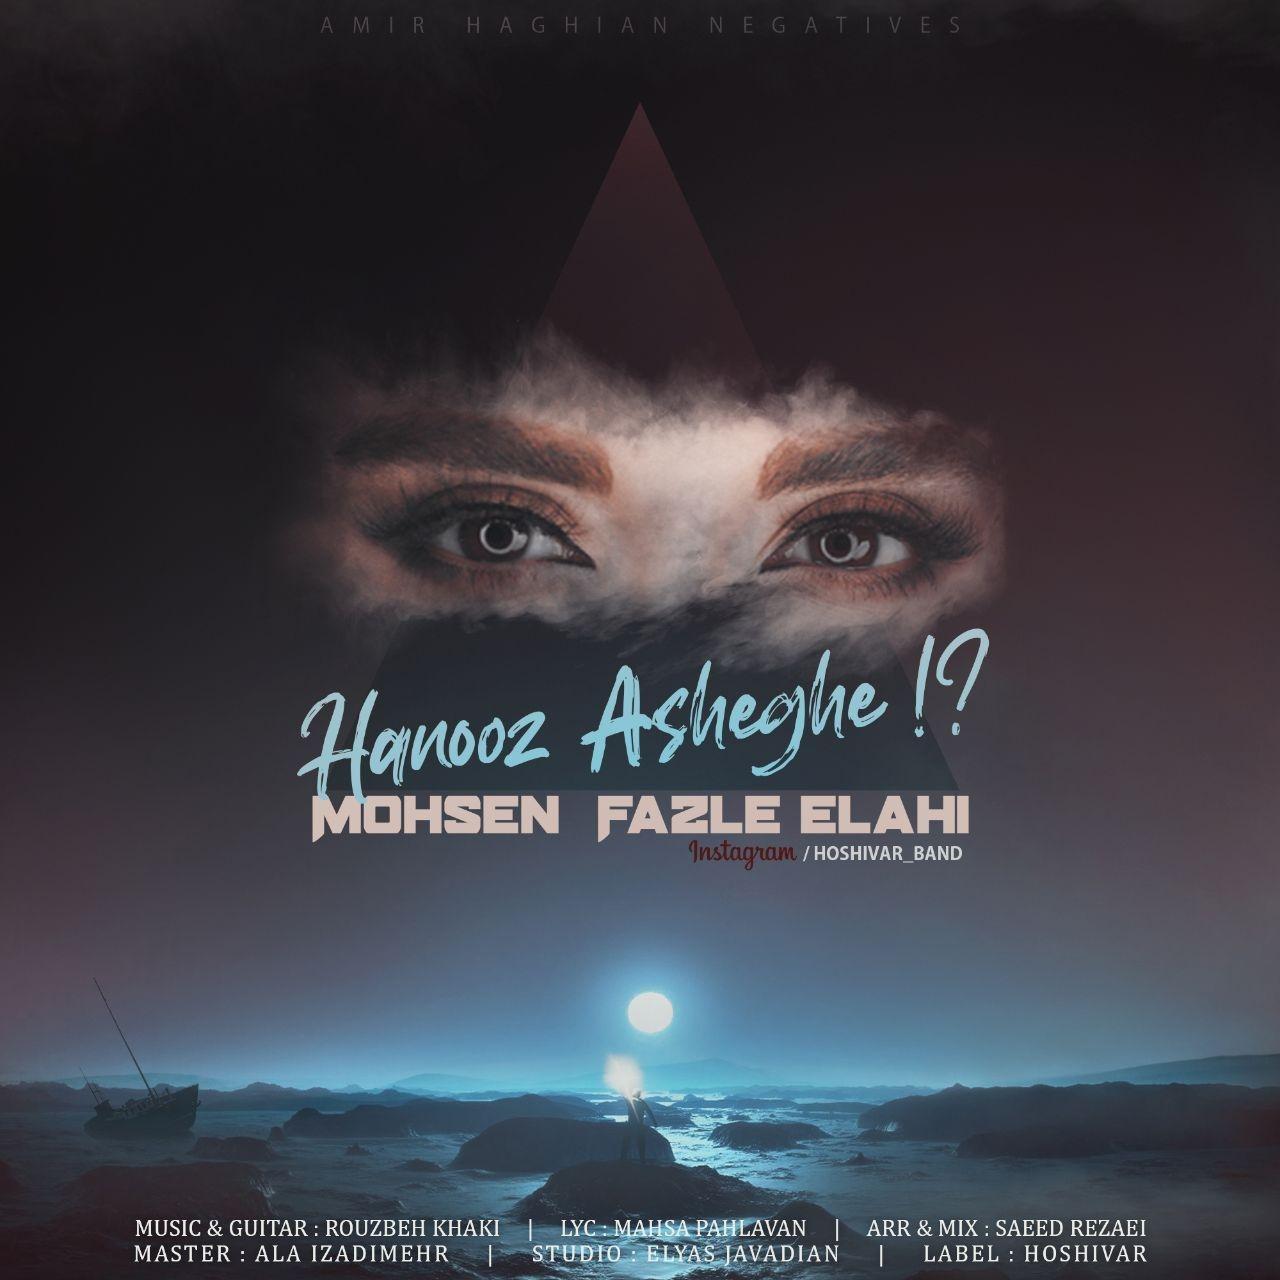 Mohsen Fazle Elahi – Hanooz Asheghe